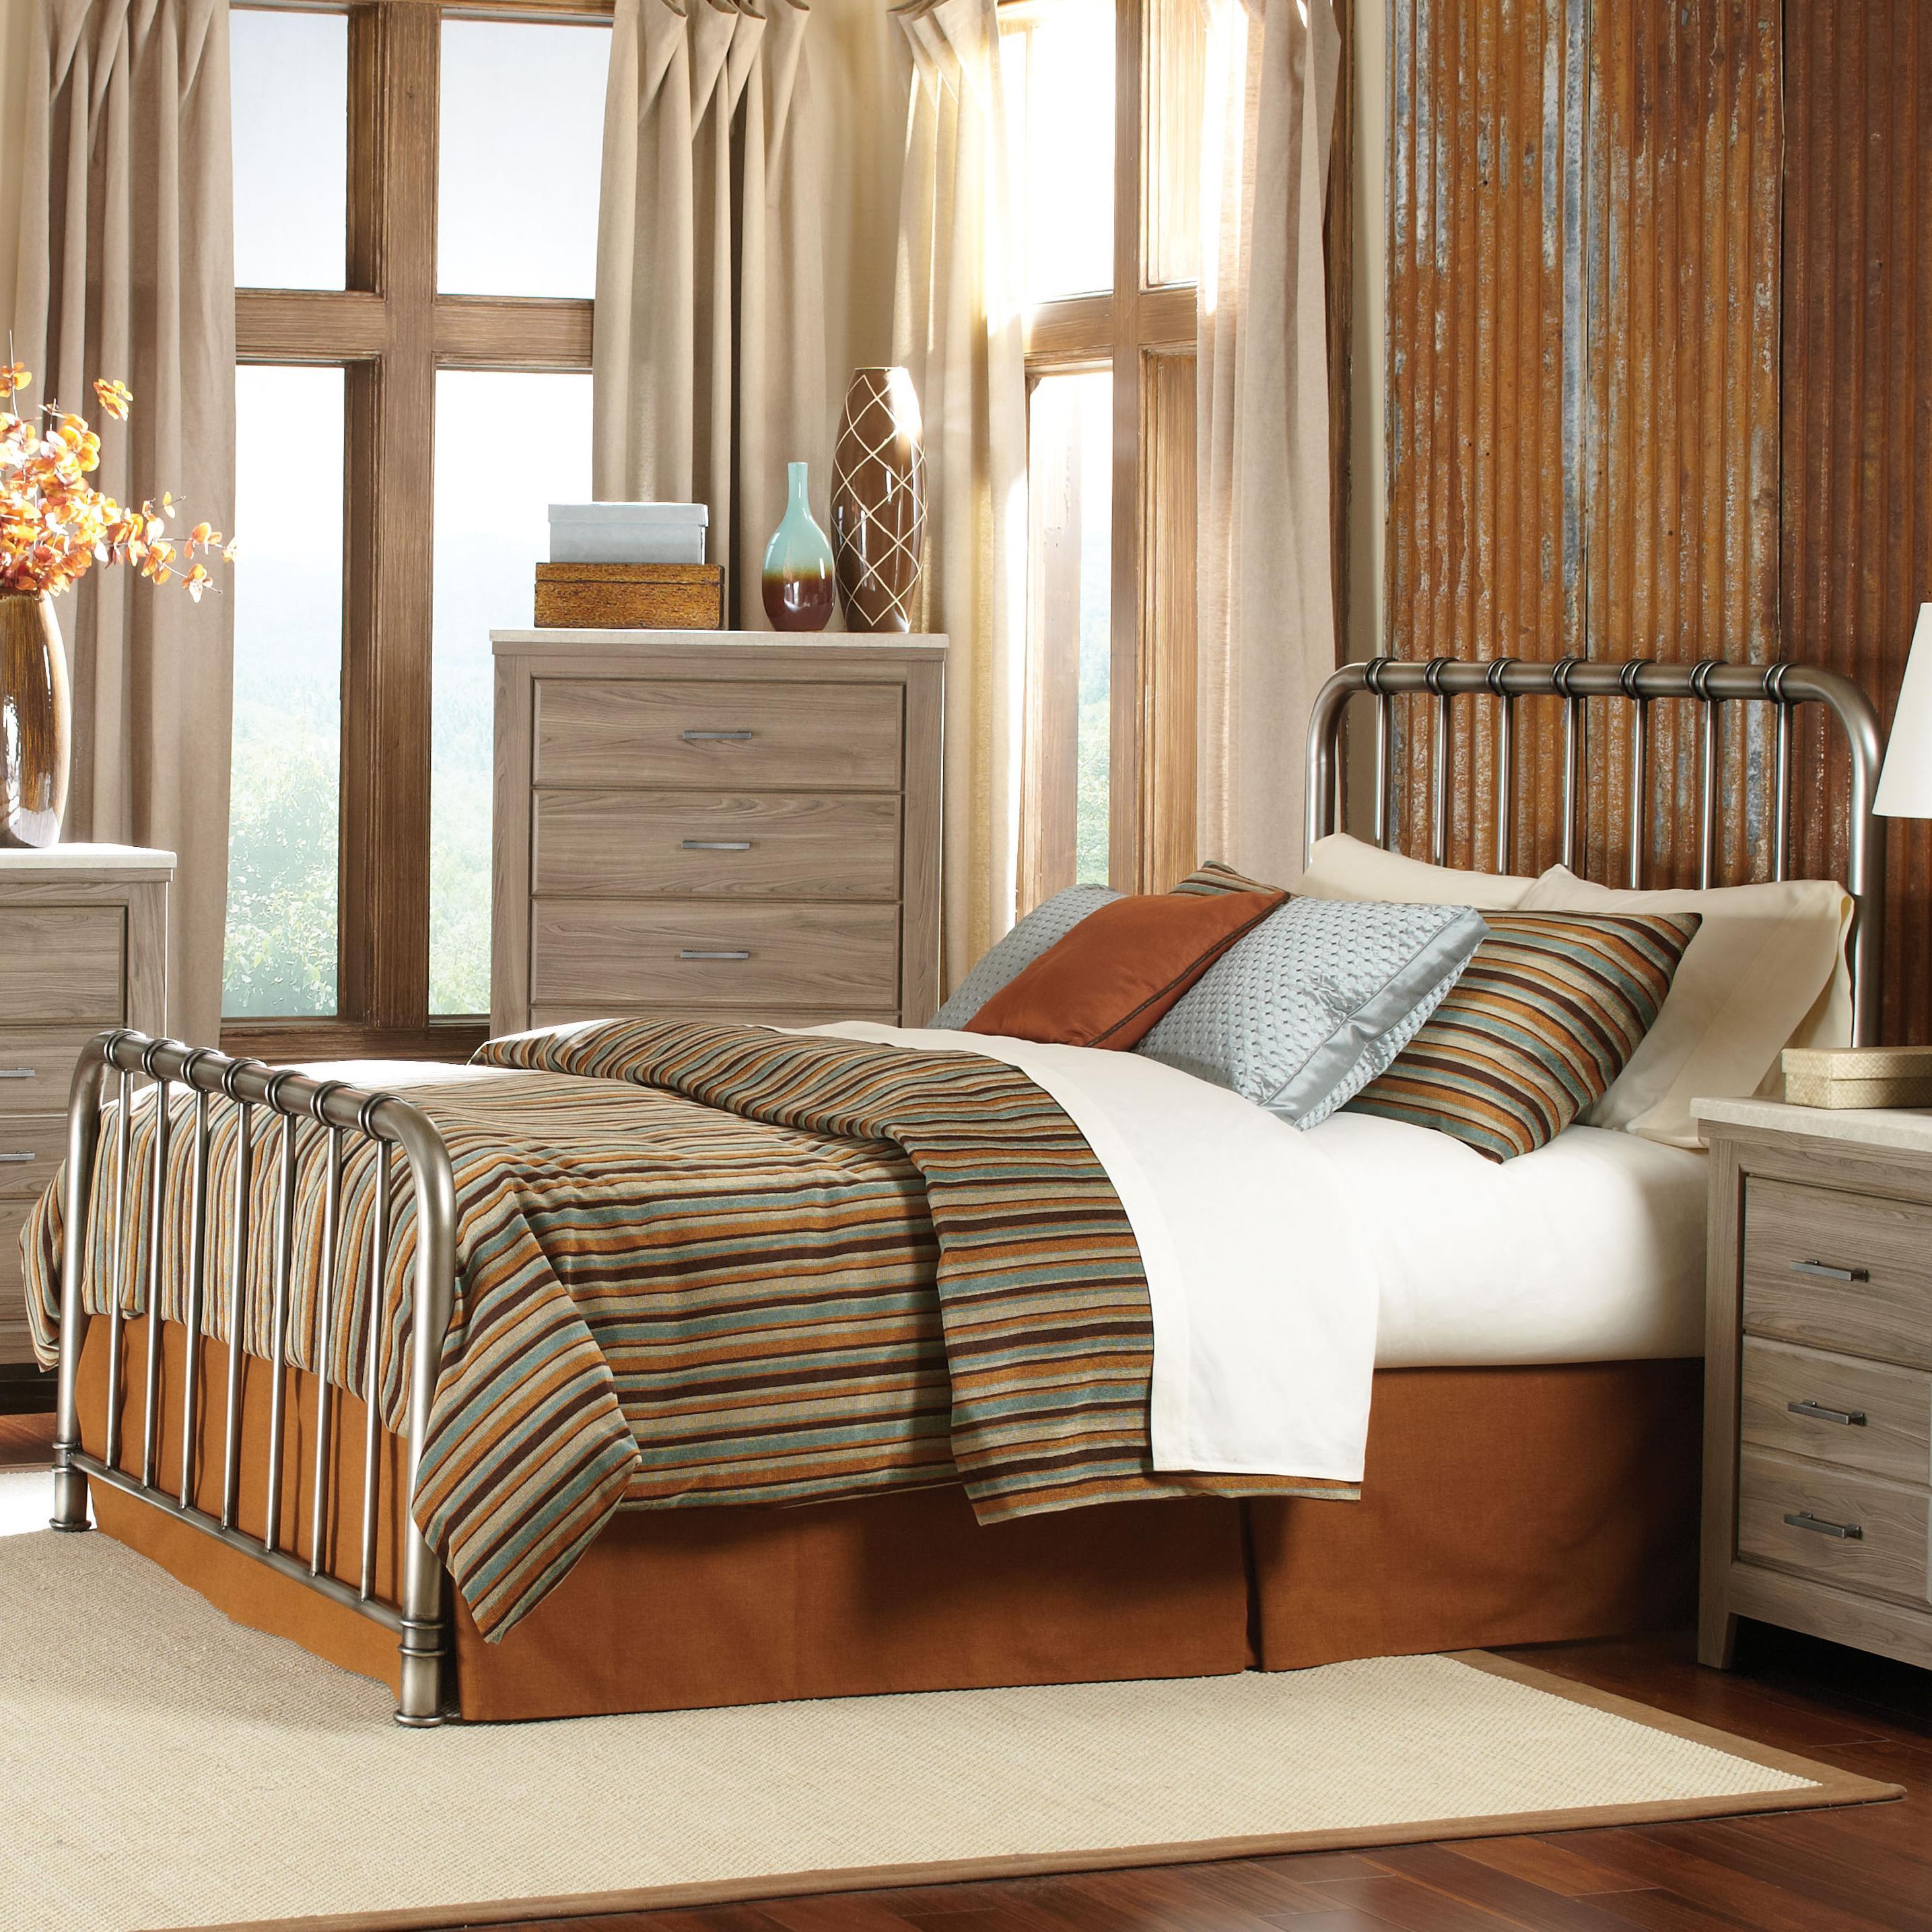 Standard Furniture Stonehill Full Metal Bed - Item Number: 87511+12